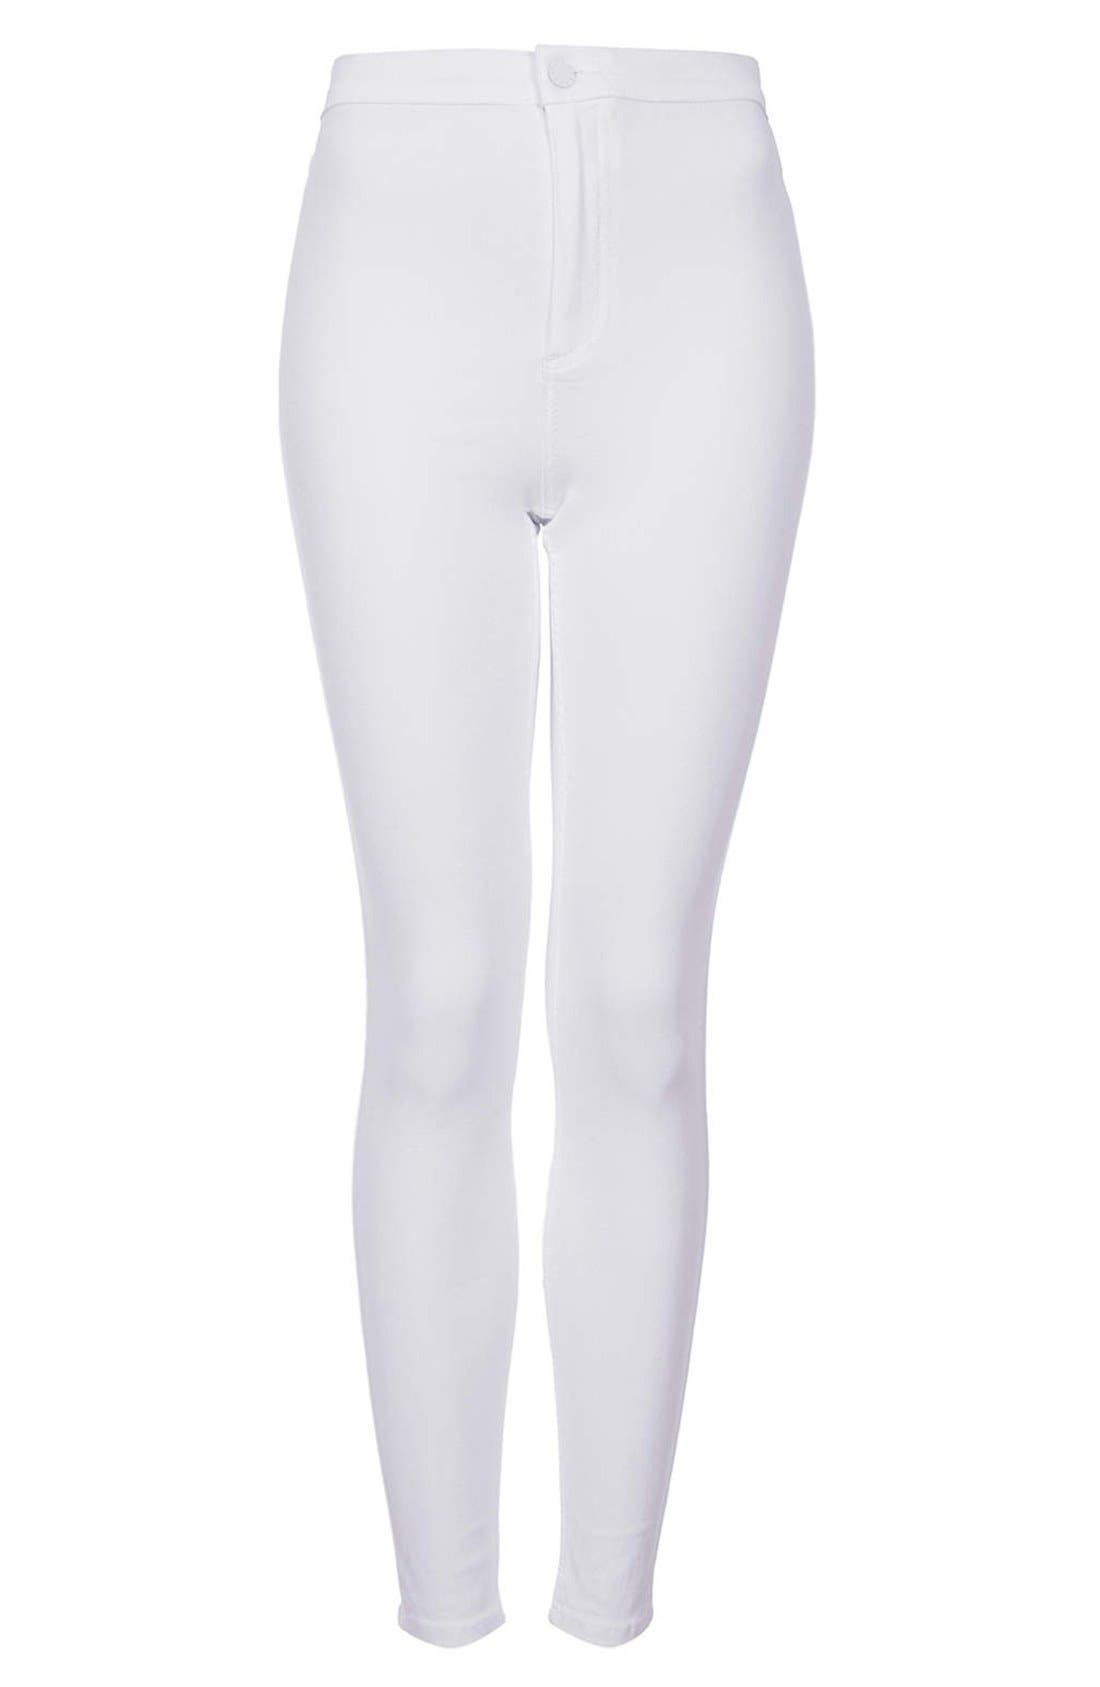 Alternate Image 3  - Topshop Moto 'Joni' High Rise Skinny Jeans (Regular & Long)